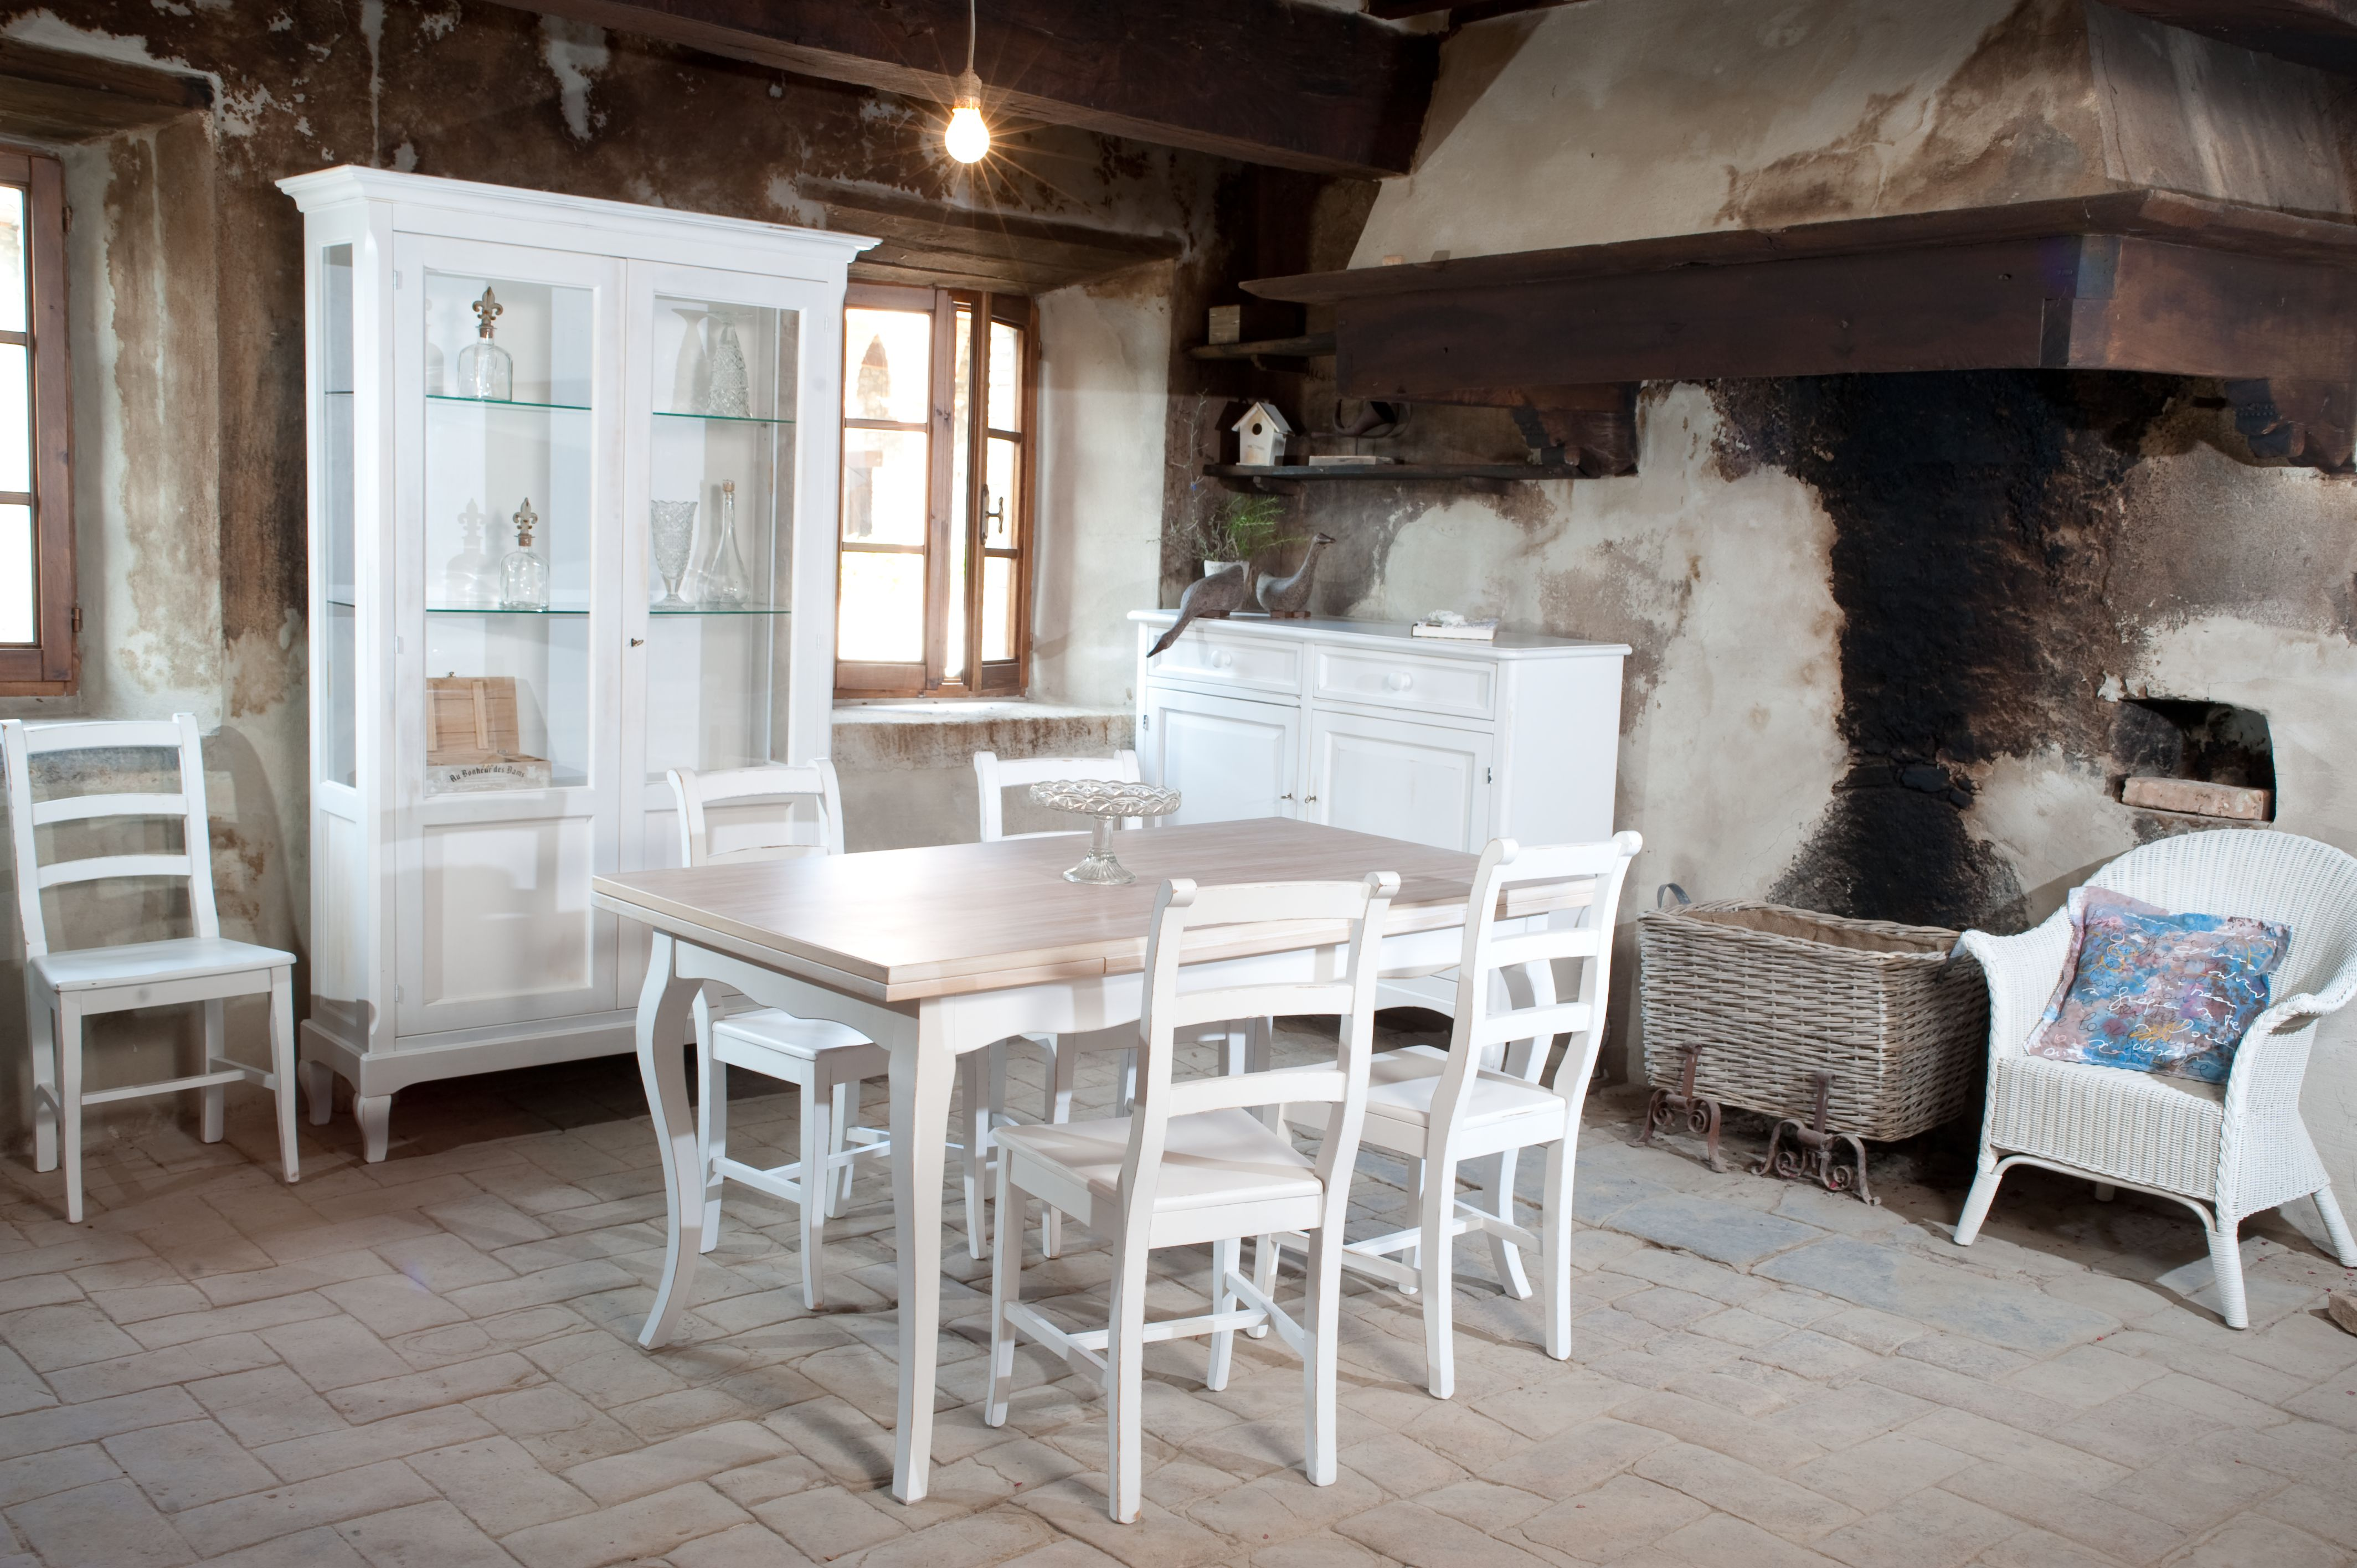 Beautiful Sala Da Pranzo Country Images - Design Trends 2017 ...